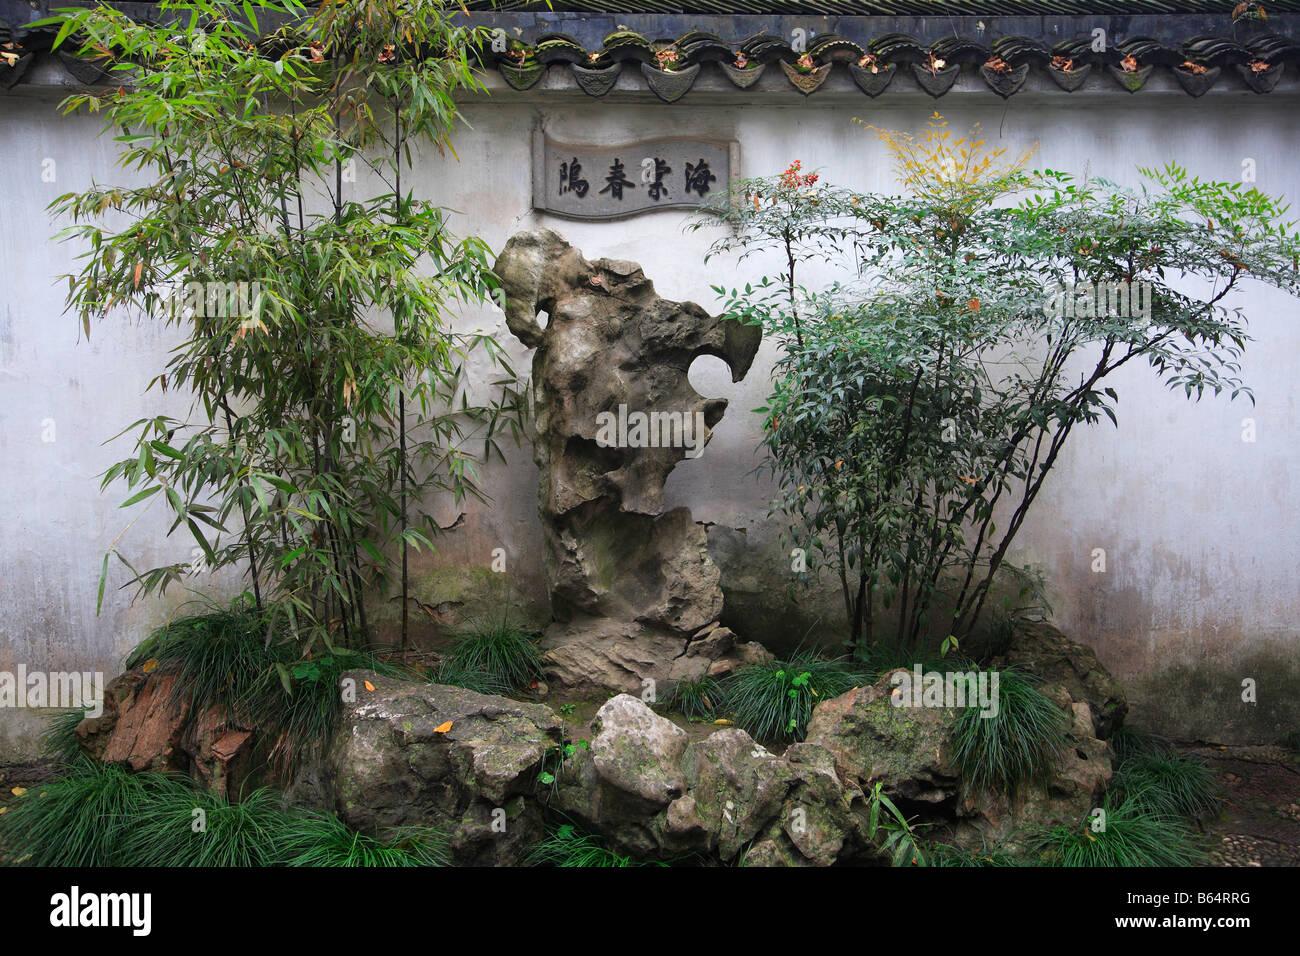 China de la provincia de Jiangsu Suzhou Jardín del Administrador Humilde. Imagen De Stock